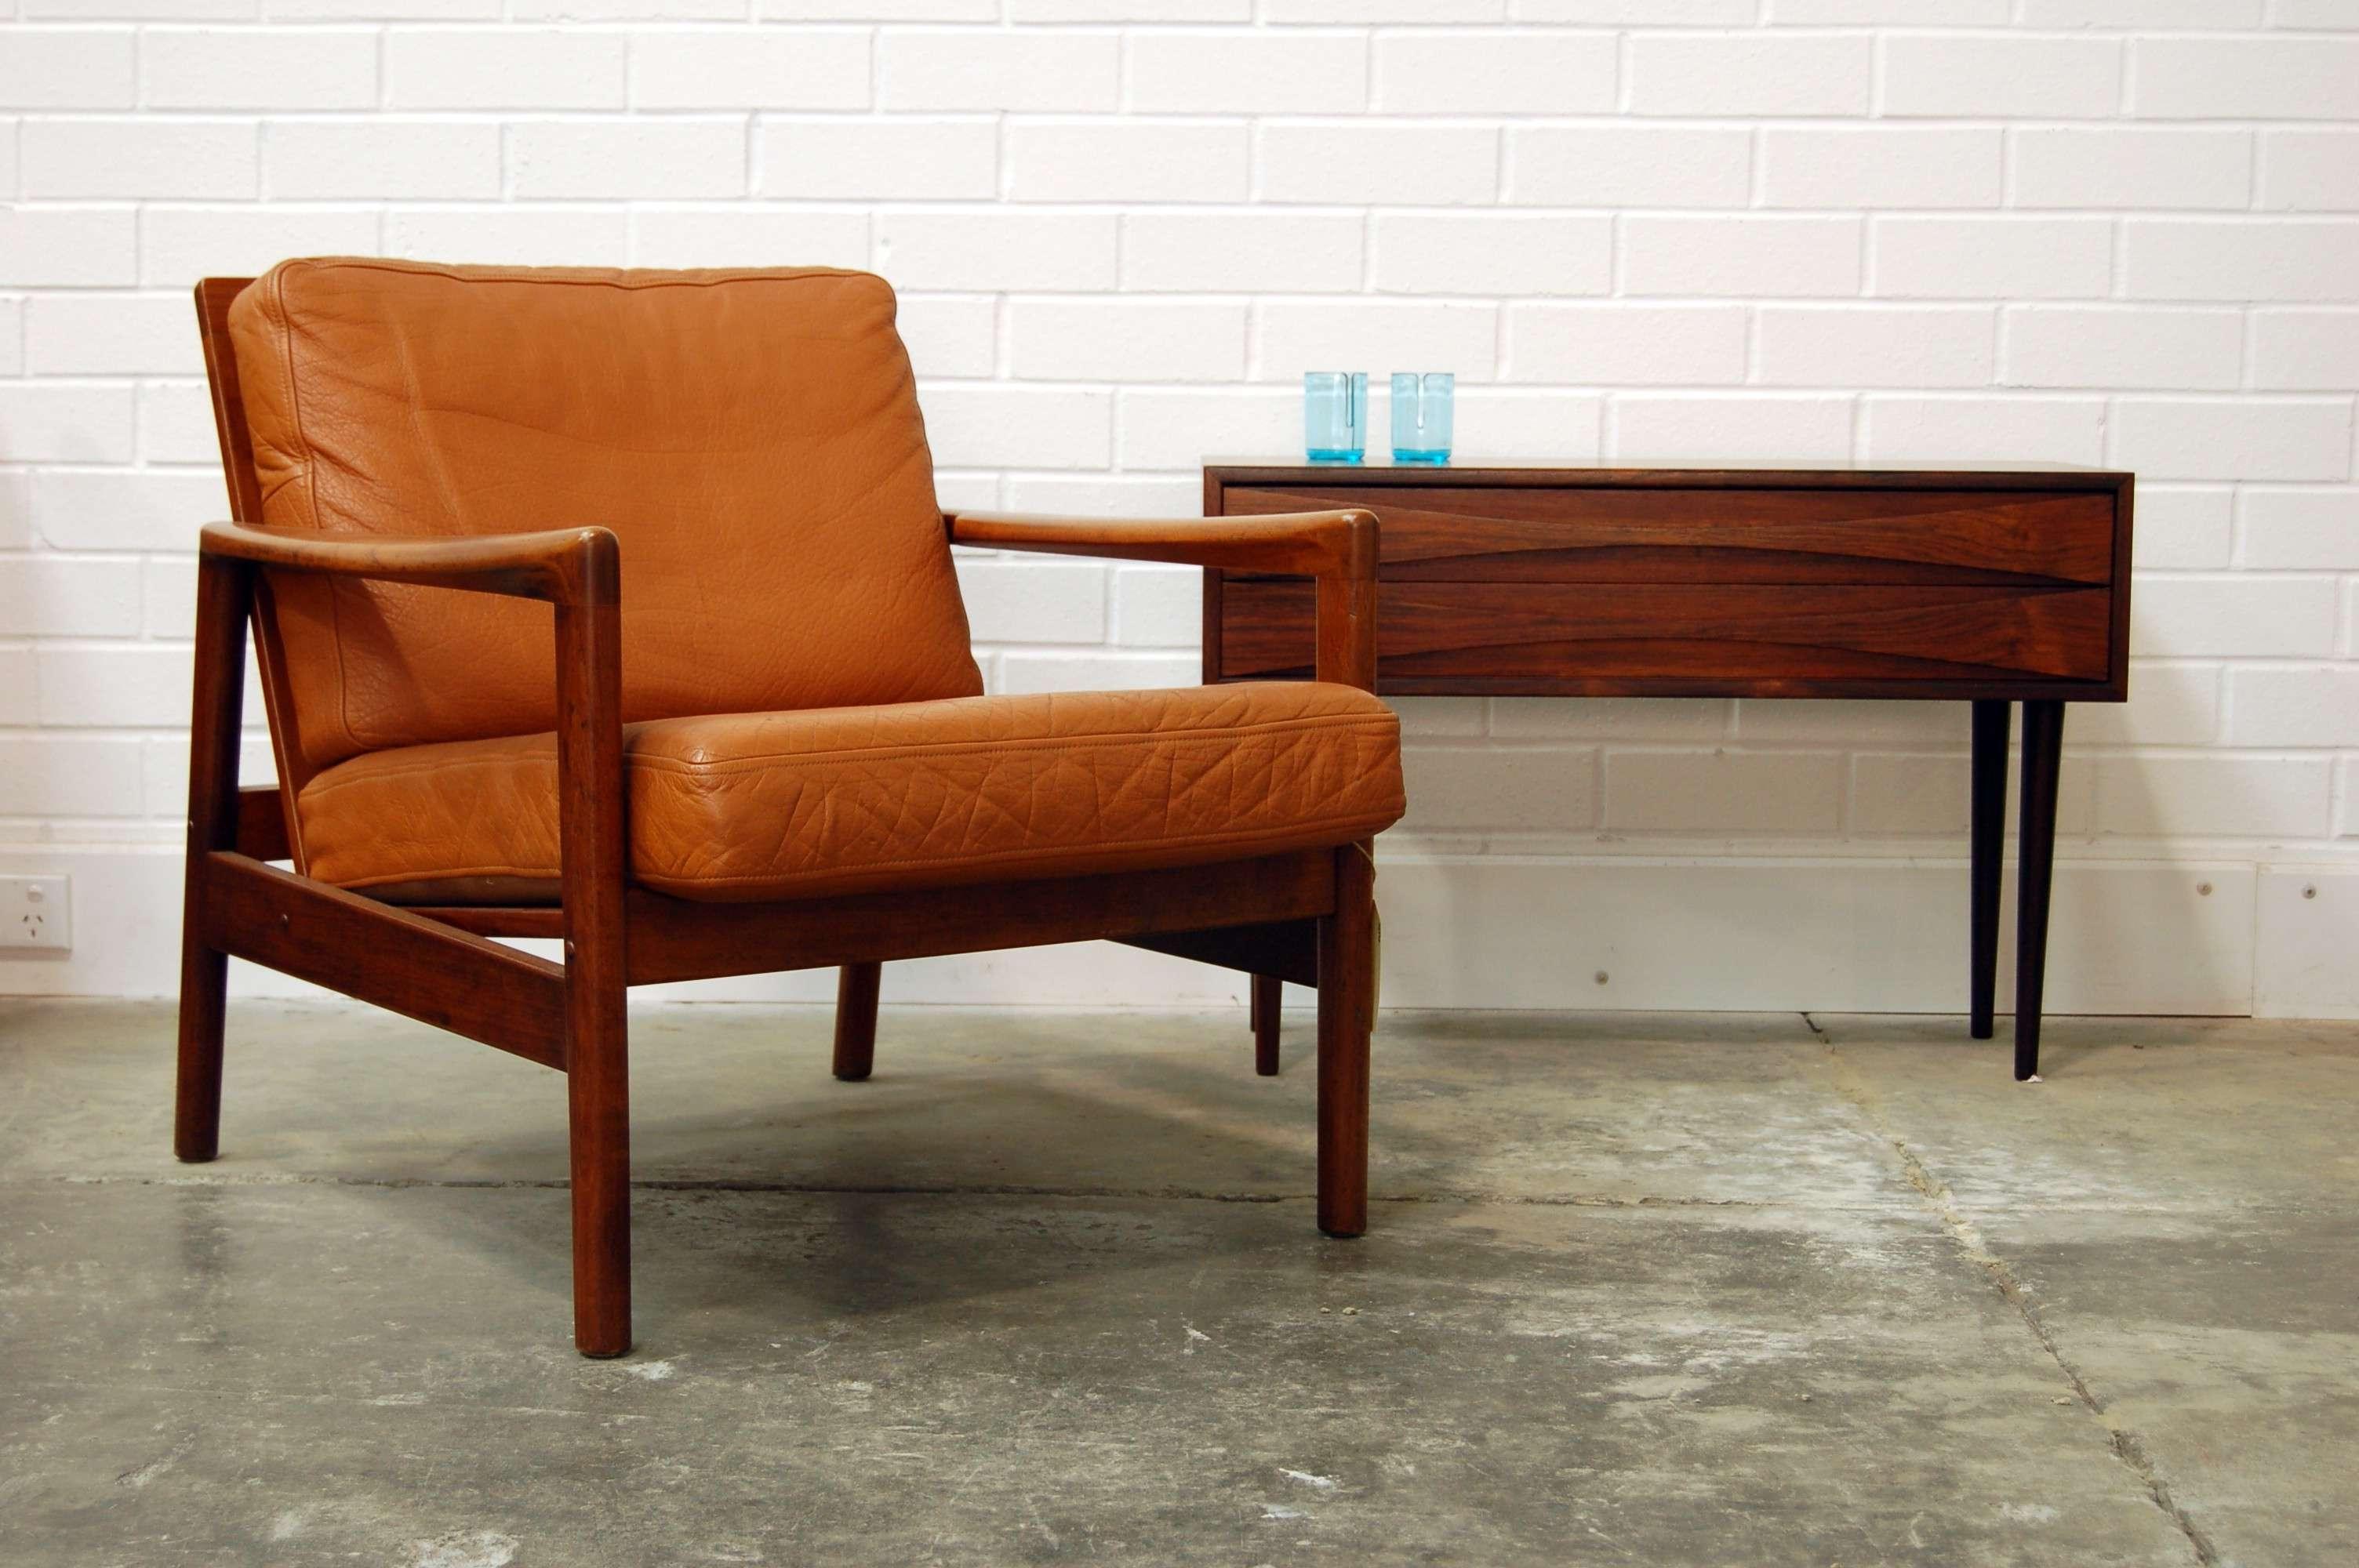 Vintage Scandinavian Furniture Danish Furniture Squarepeg Home With Regard To Danish Retro Sideboards (View 13 of 20)